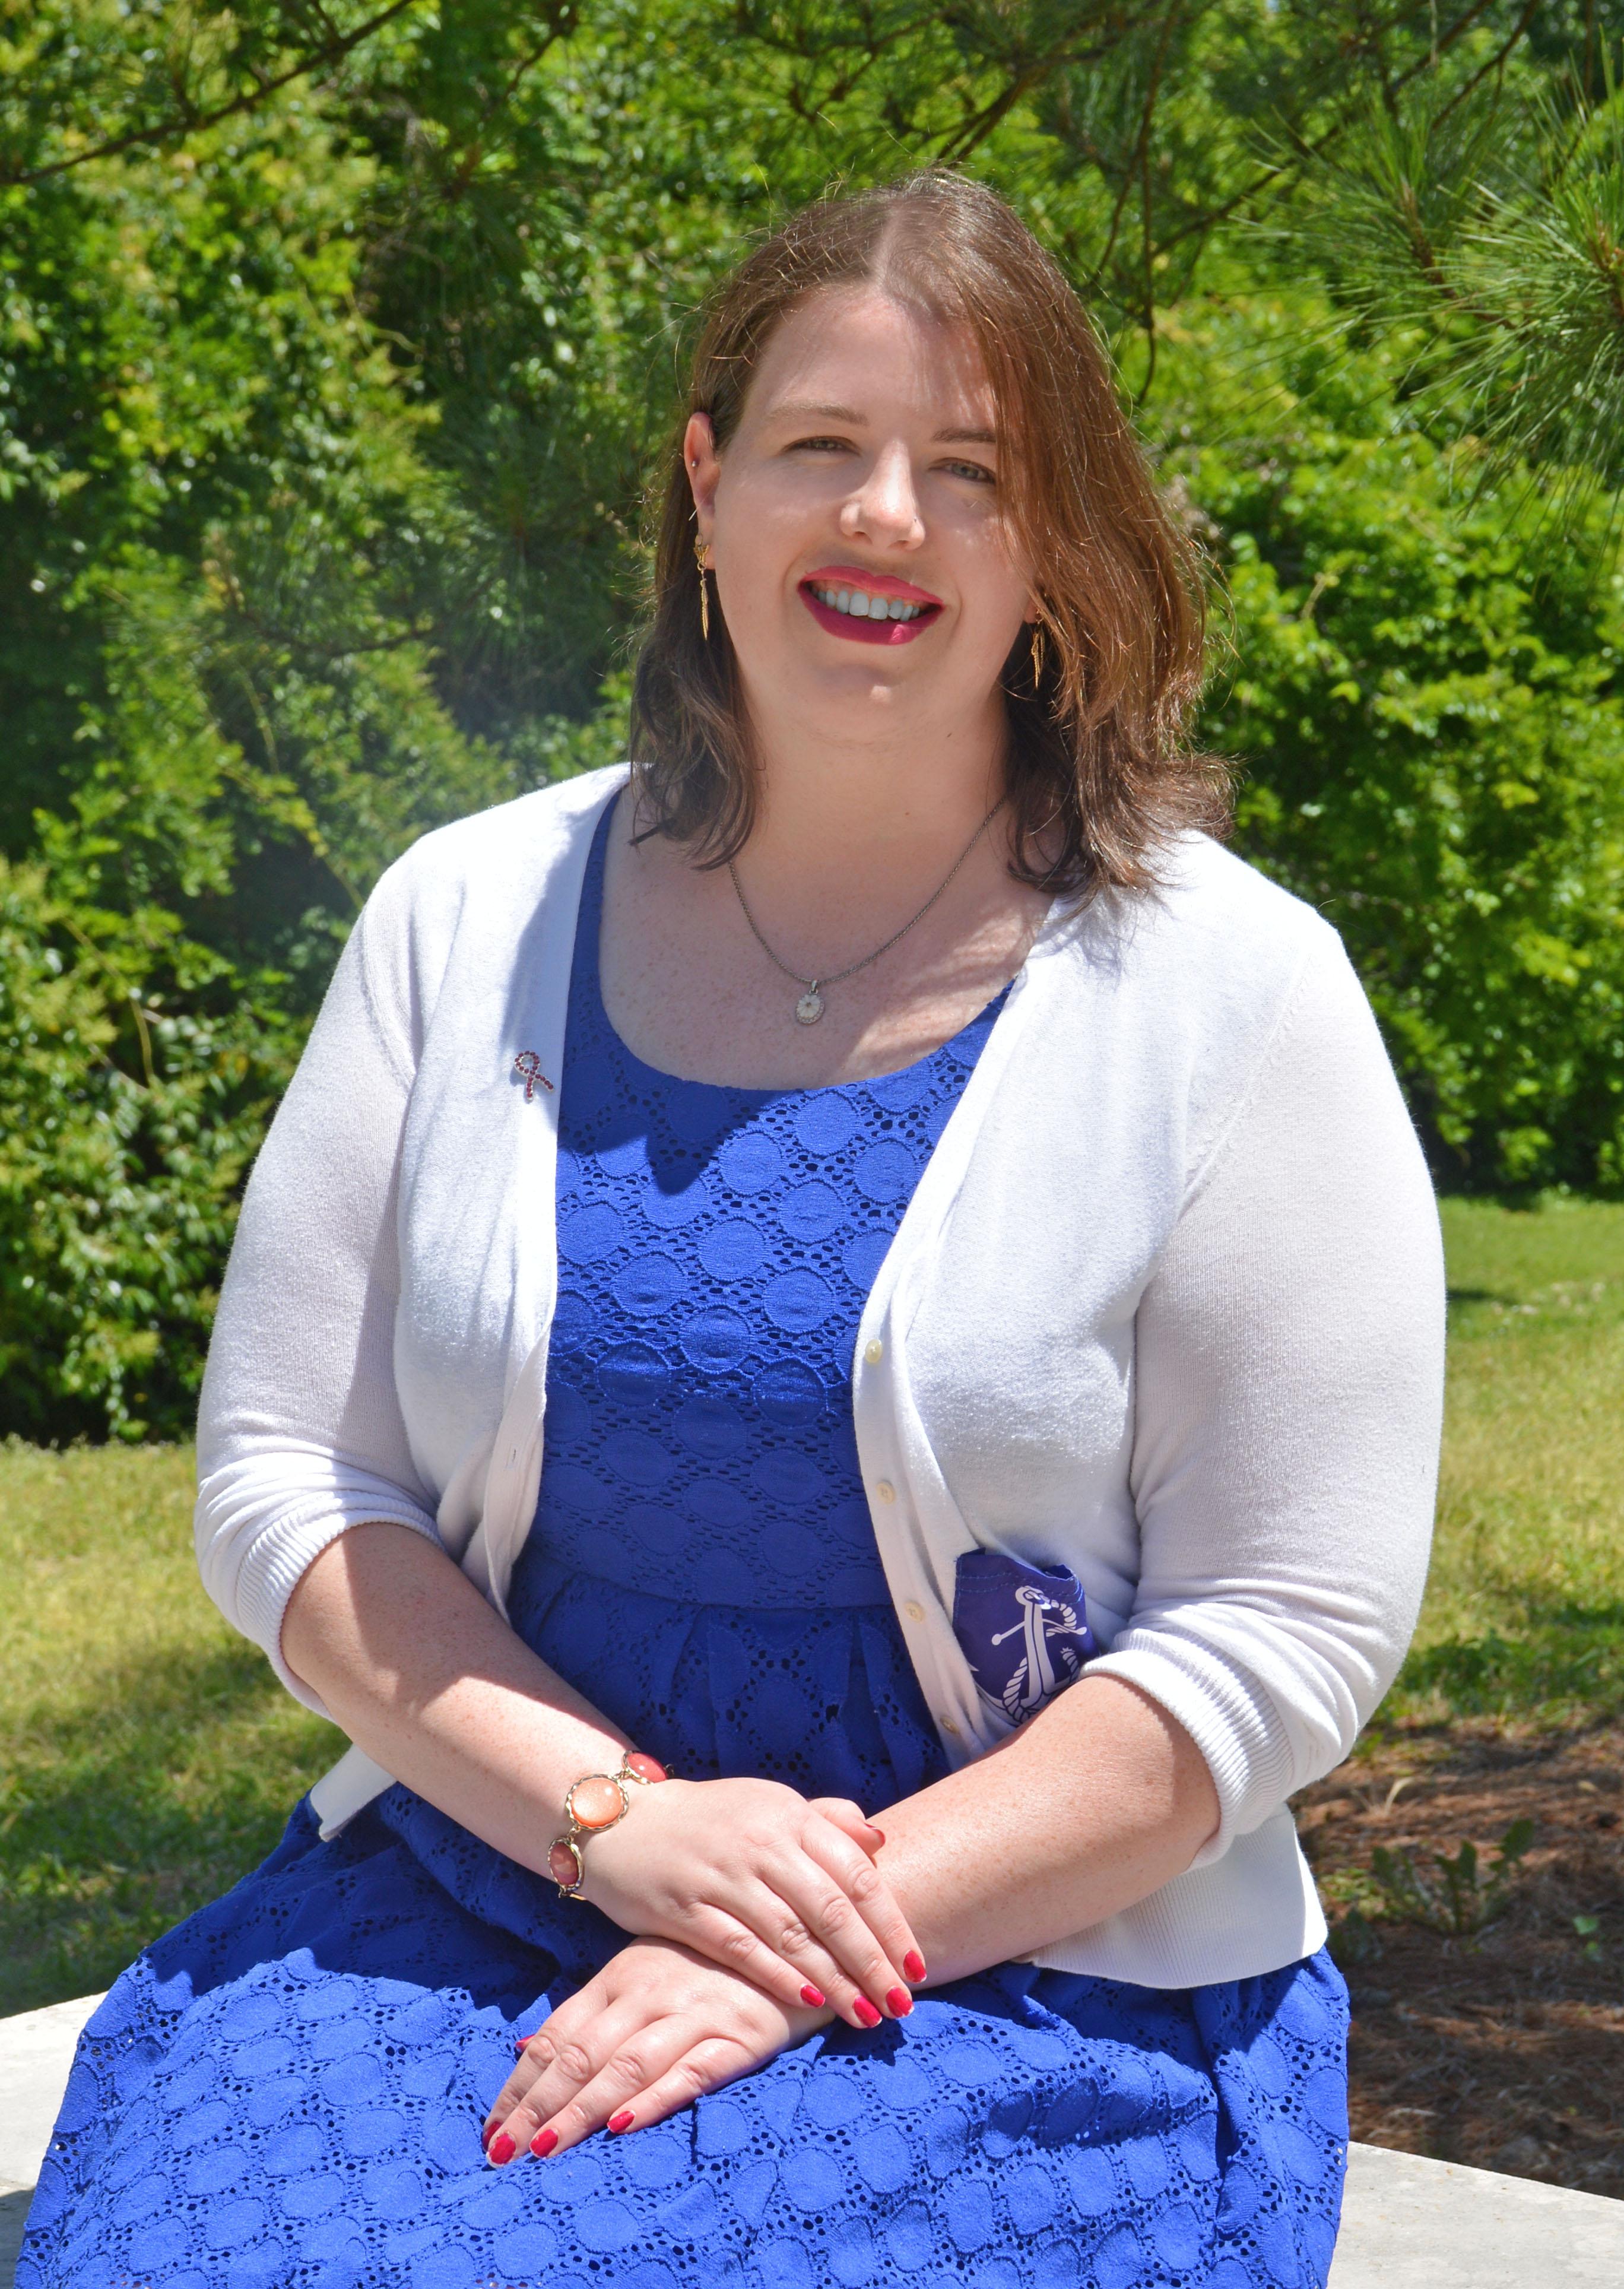 Heather-Rennee Gooch